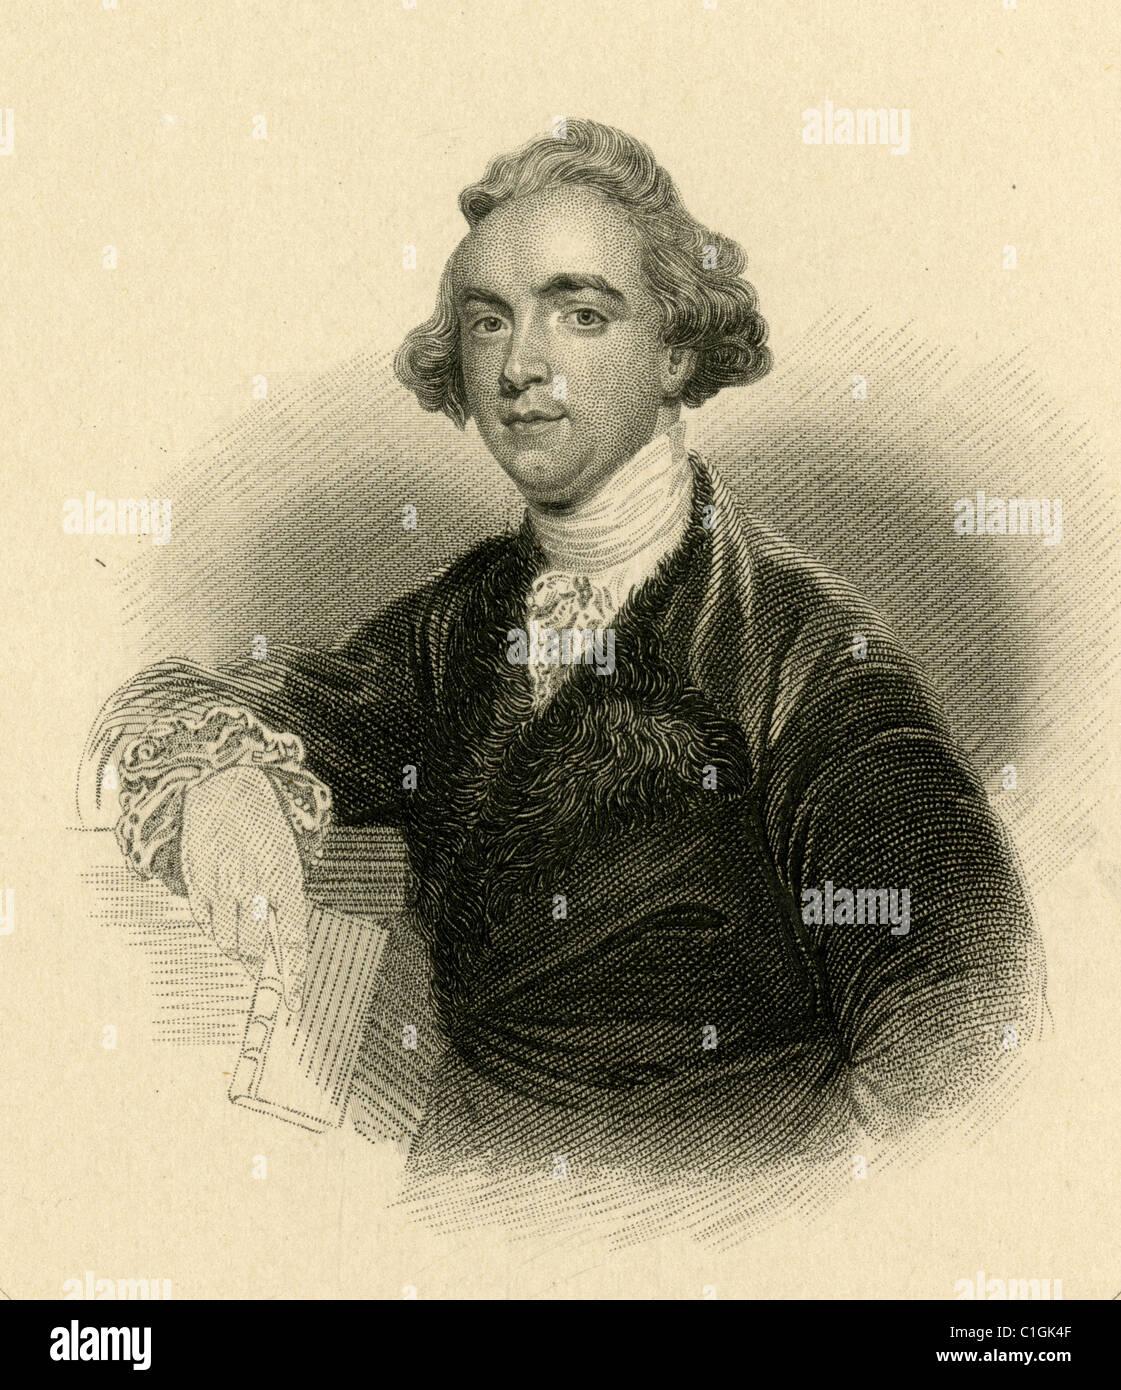 Sir William Jones - Stock Image